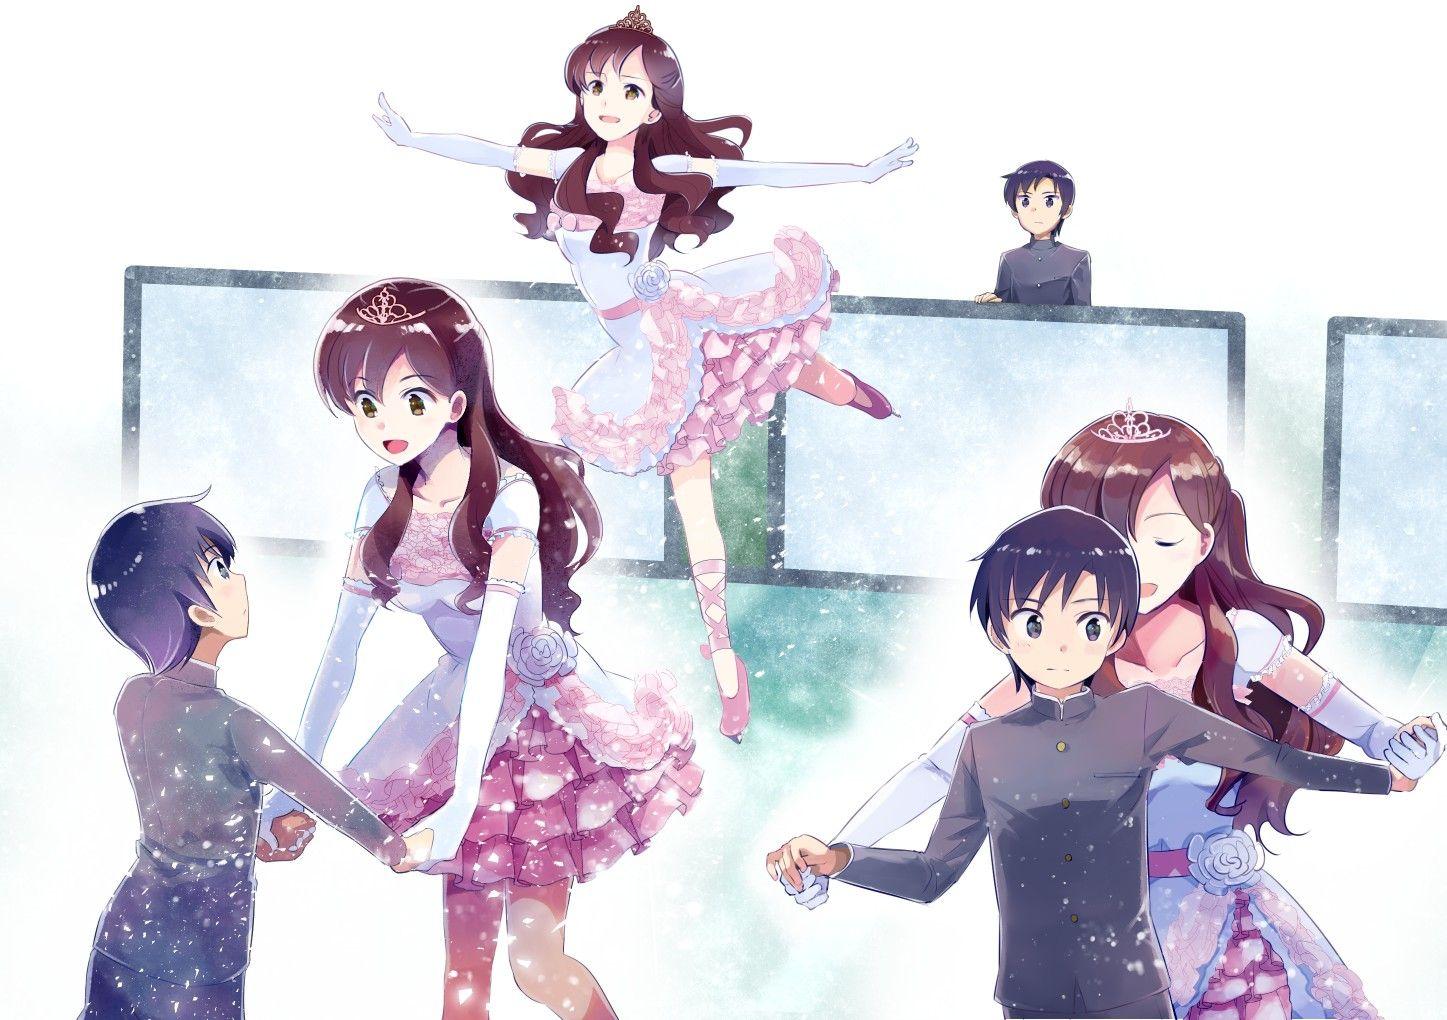 Pin by 🌟IVA🌟 on Pretty rhythm/Puri para Art, Anime, Pretty